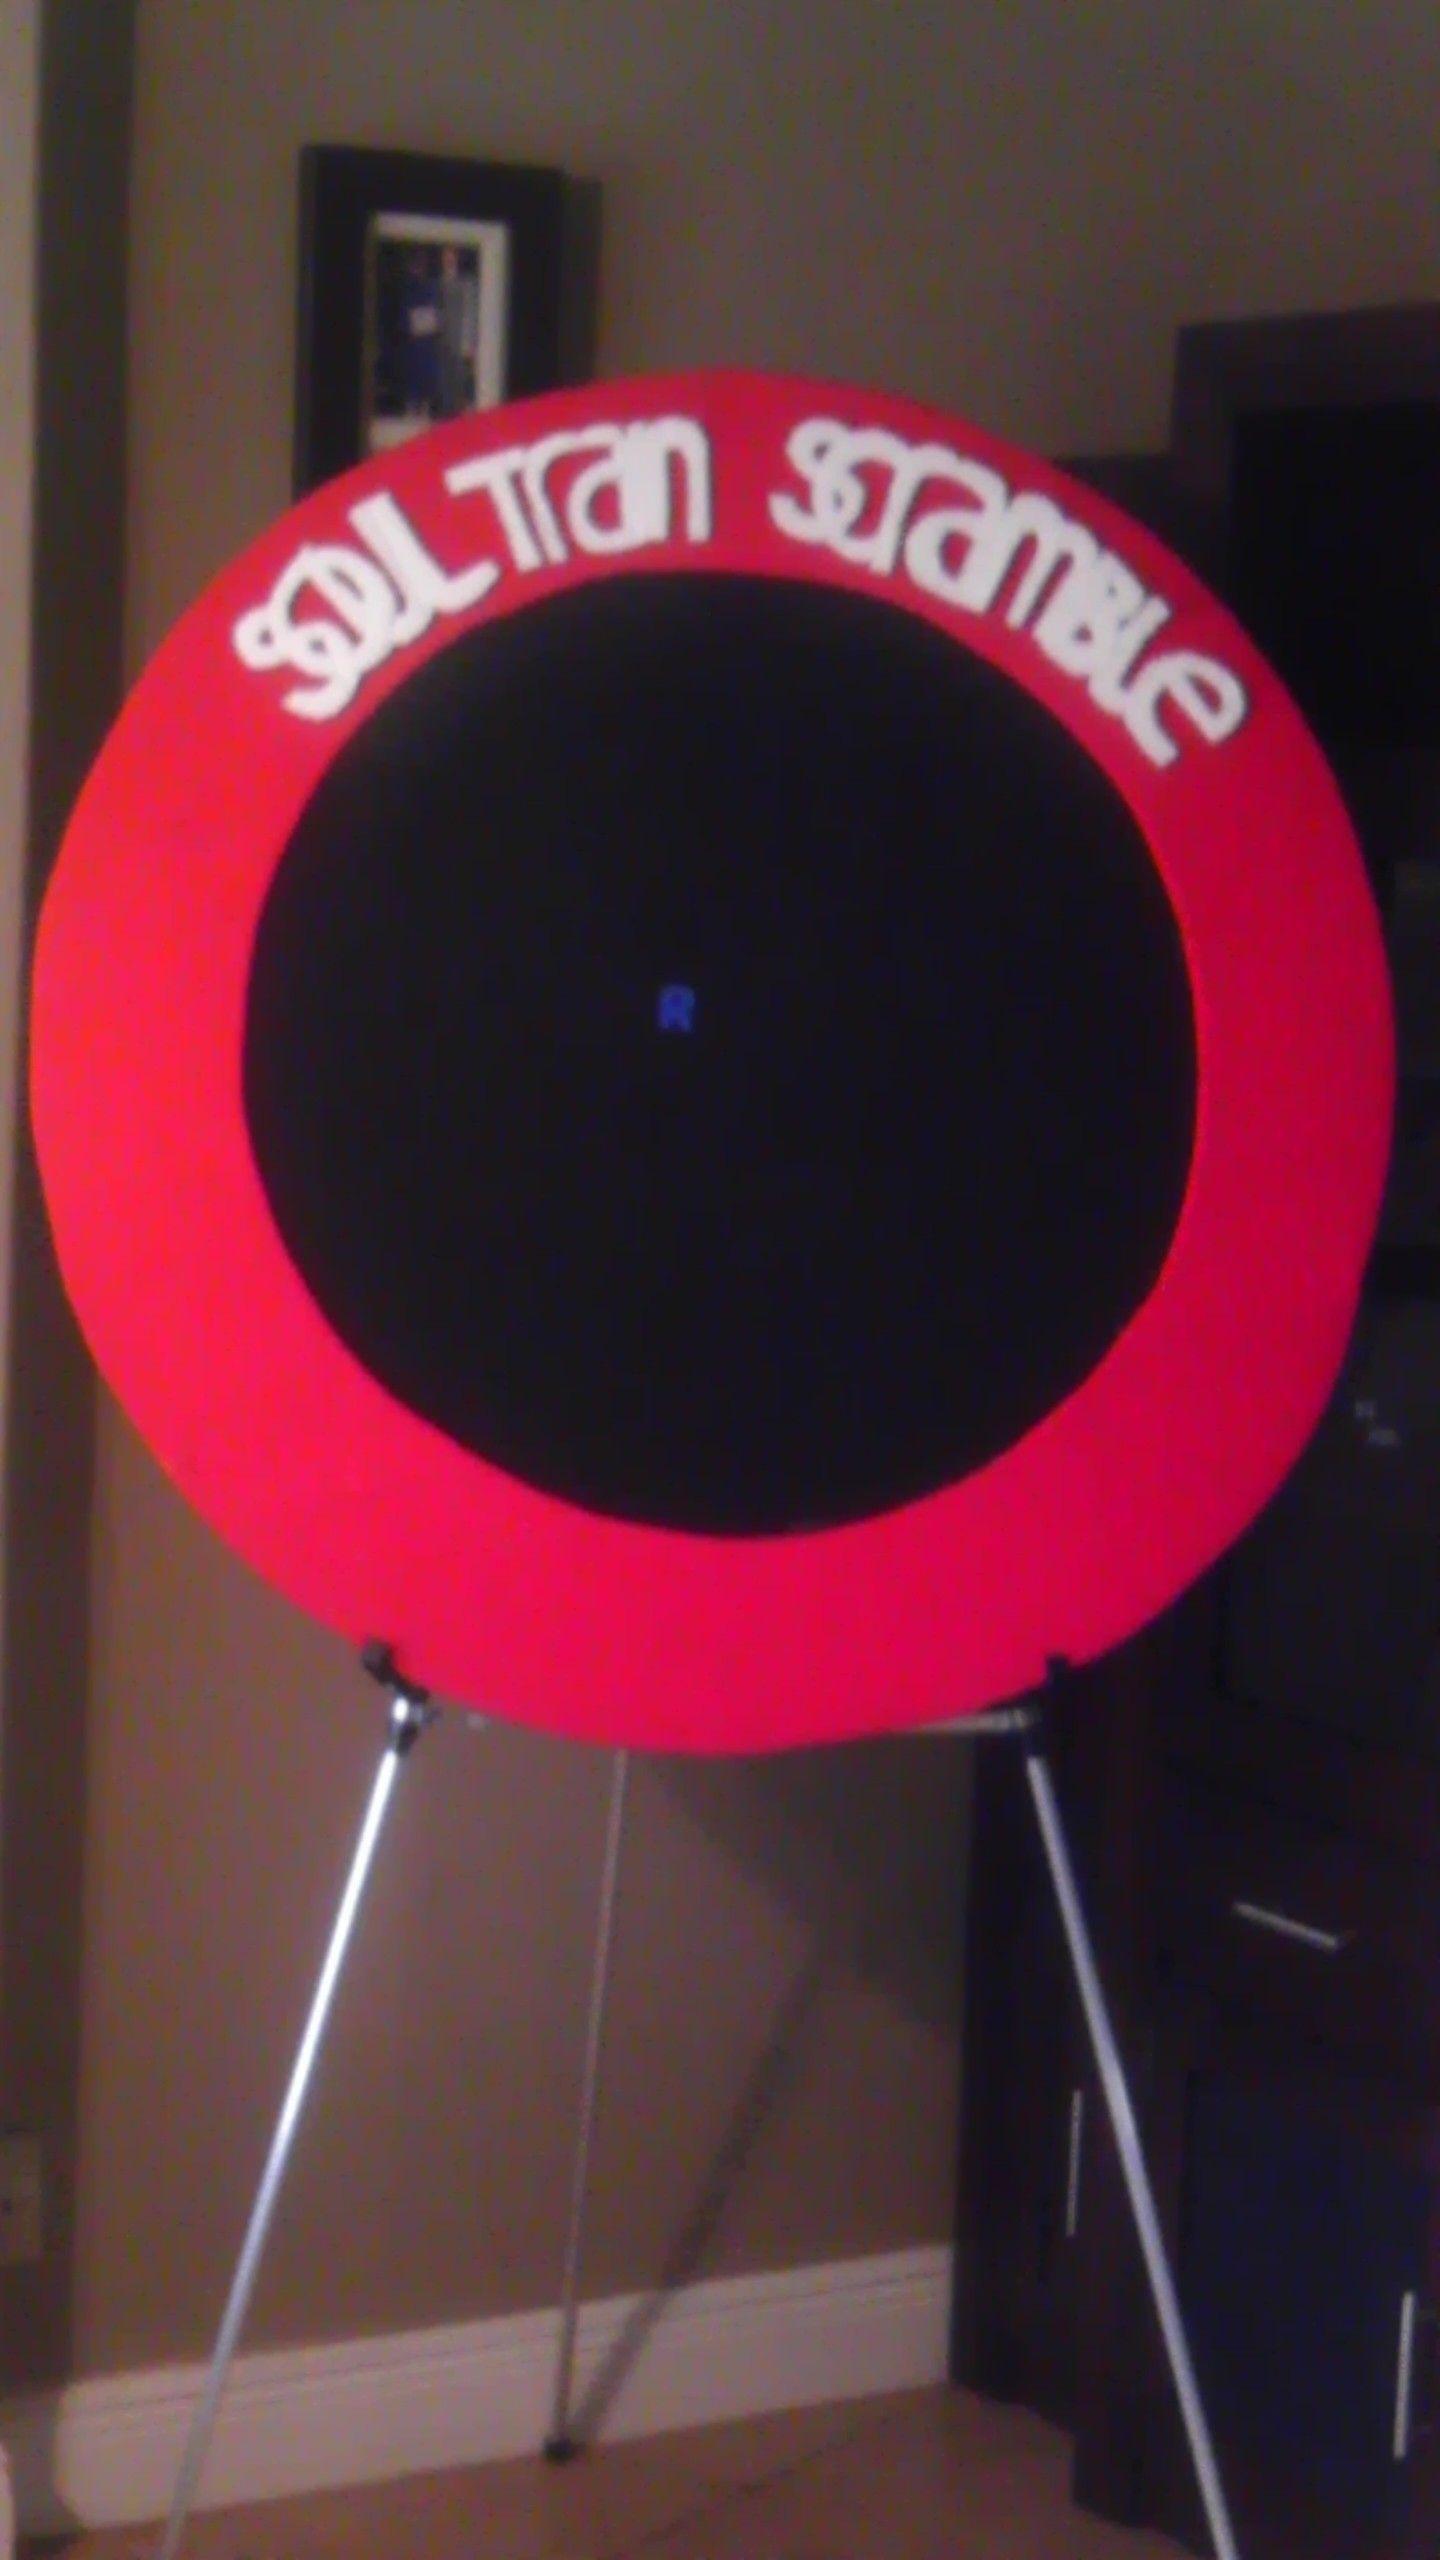 Soul Train Scramble Board Sorry Guys For The Lateness Description Red Felt To Cover Cardboard Rim Black Circular Wood